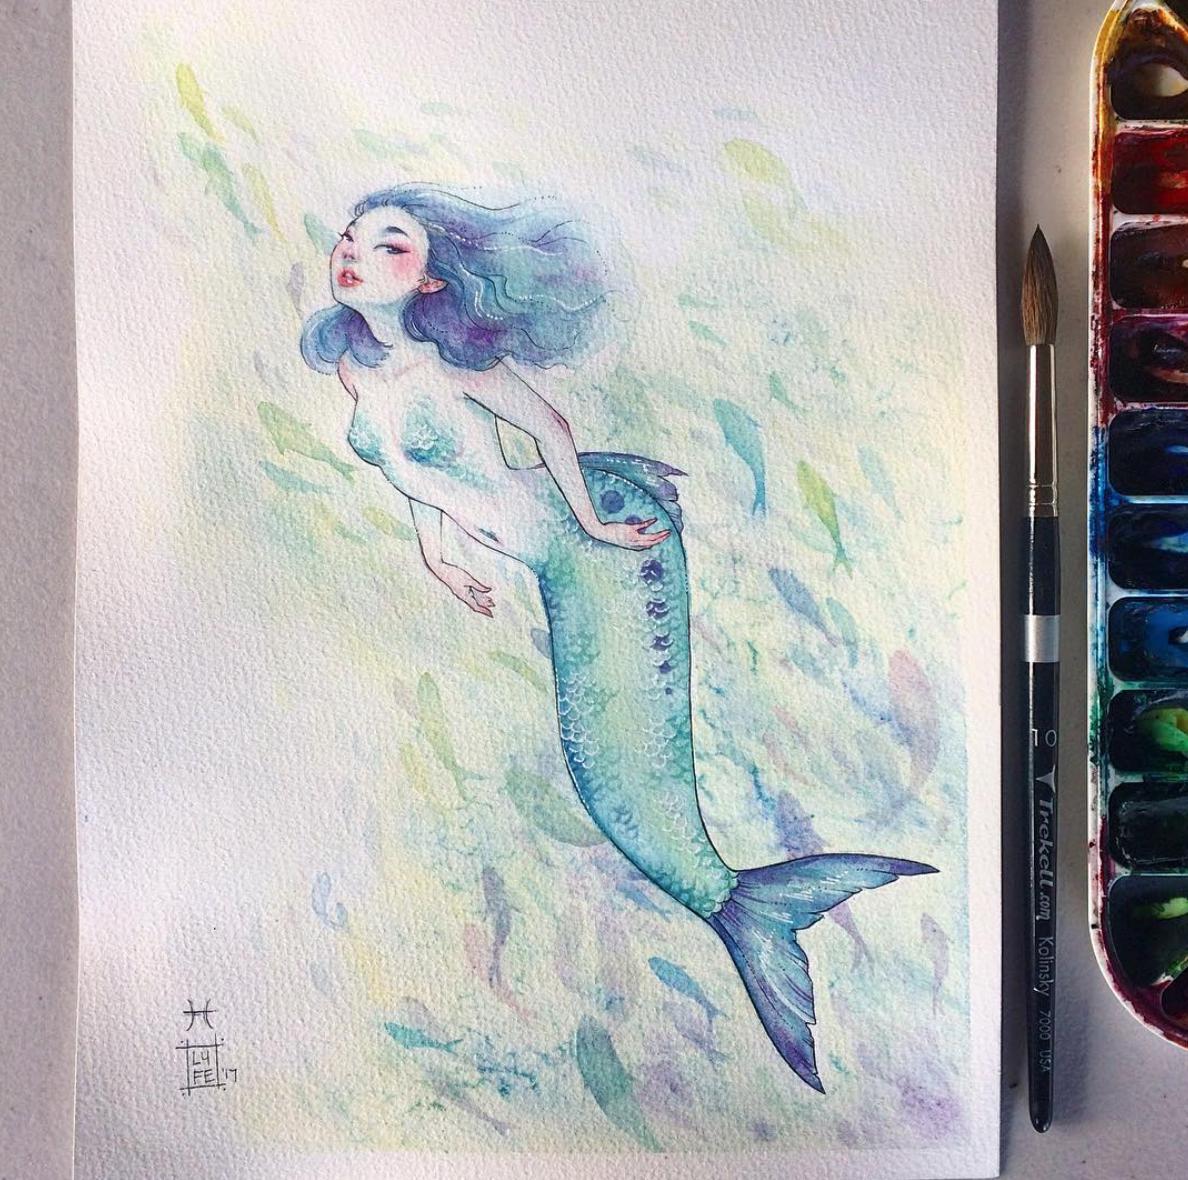 Pisces Mermaid Original Lyfe Illustration Online Store Powered